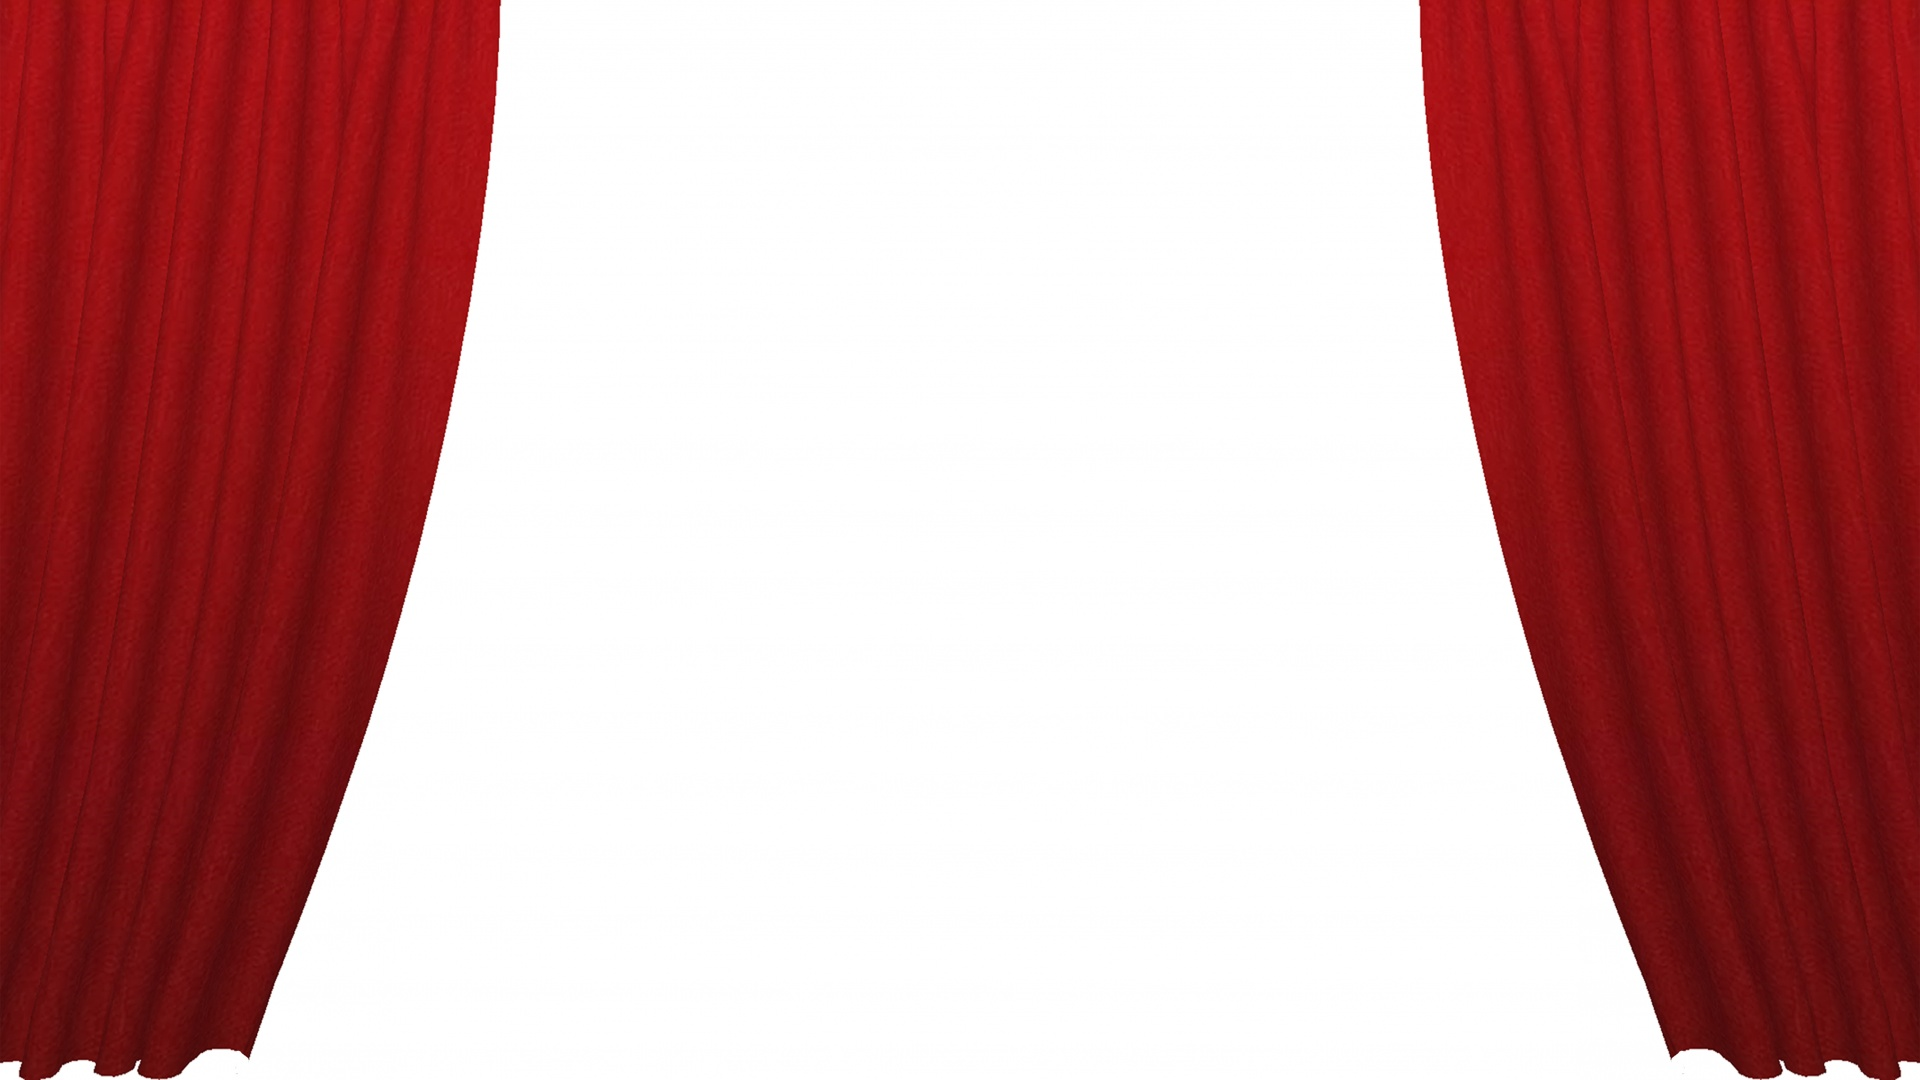 100 Curtains